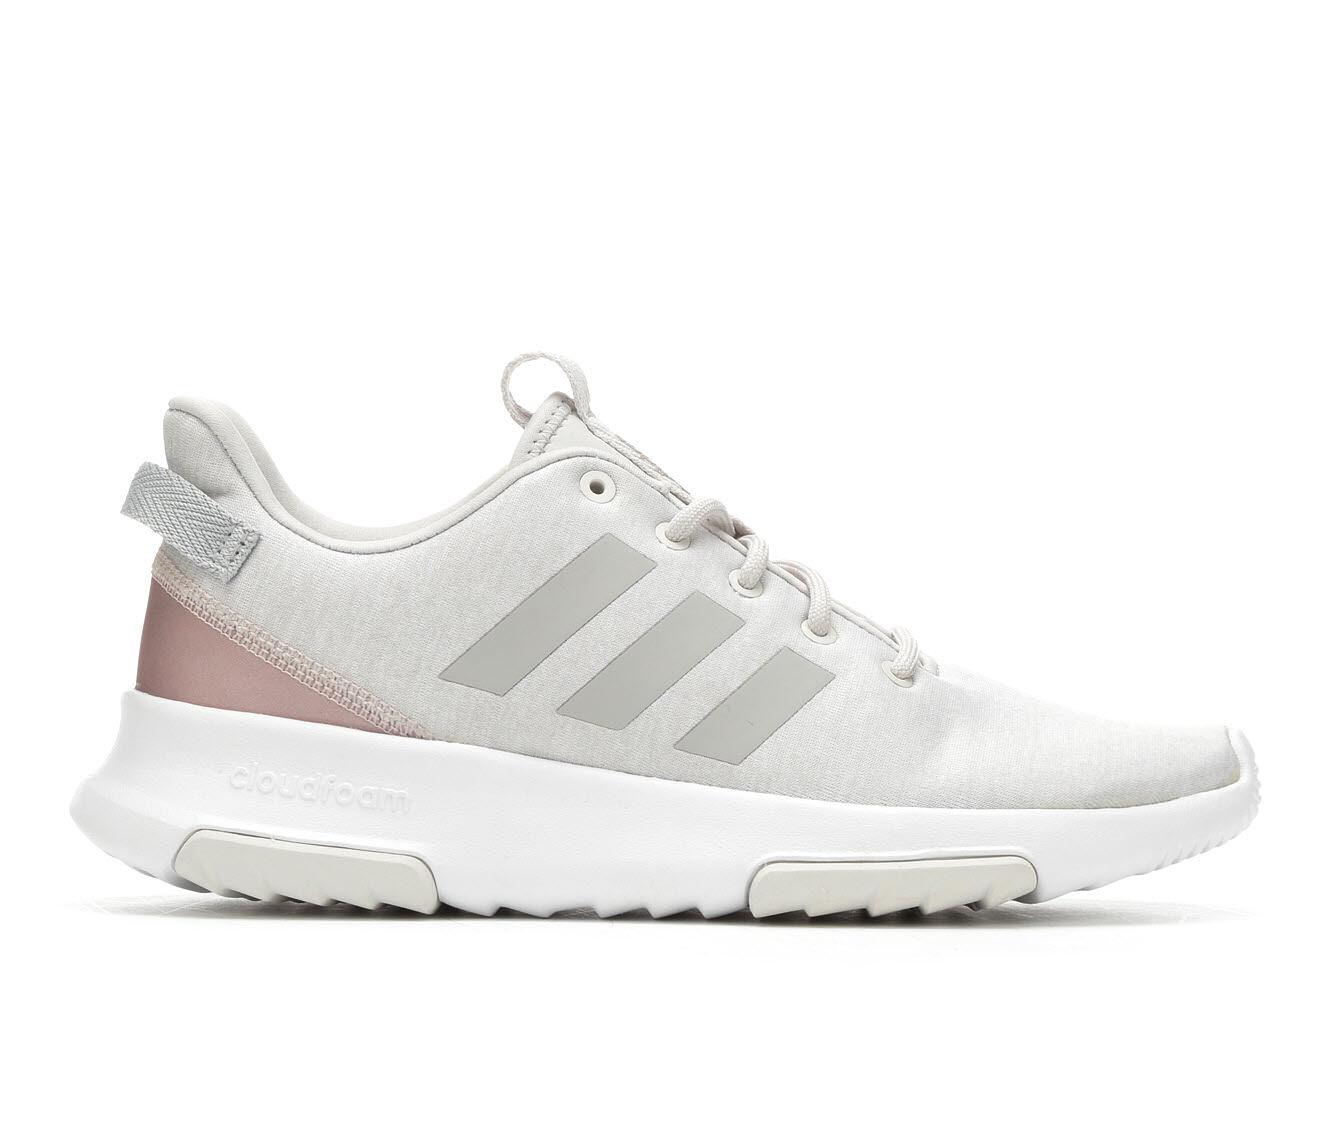 adidas cloudfoam racer tr mens running shoes